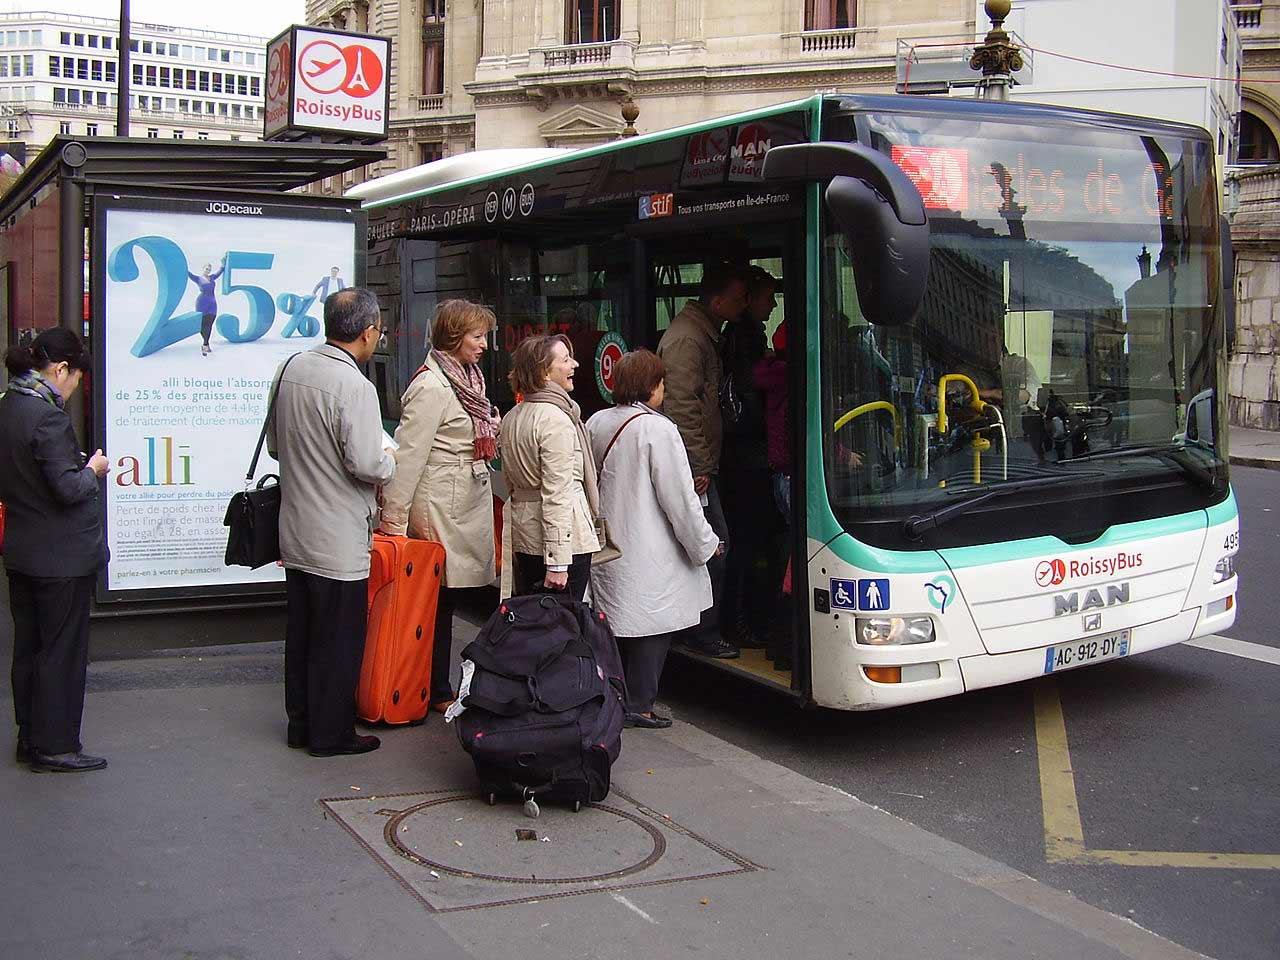 Flughafentransfer RER Paris Charles de Gaulle